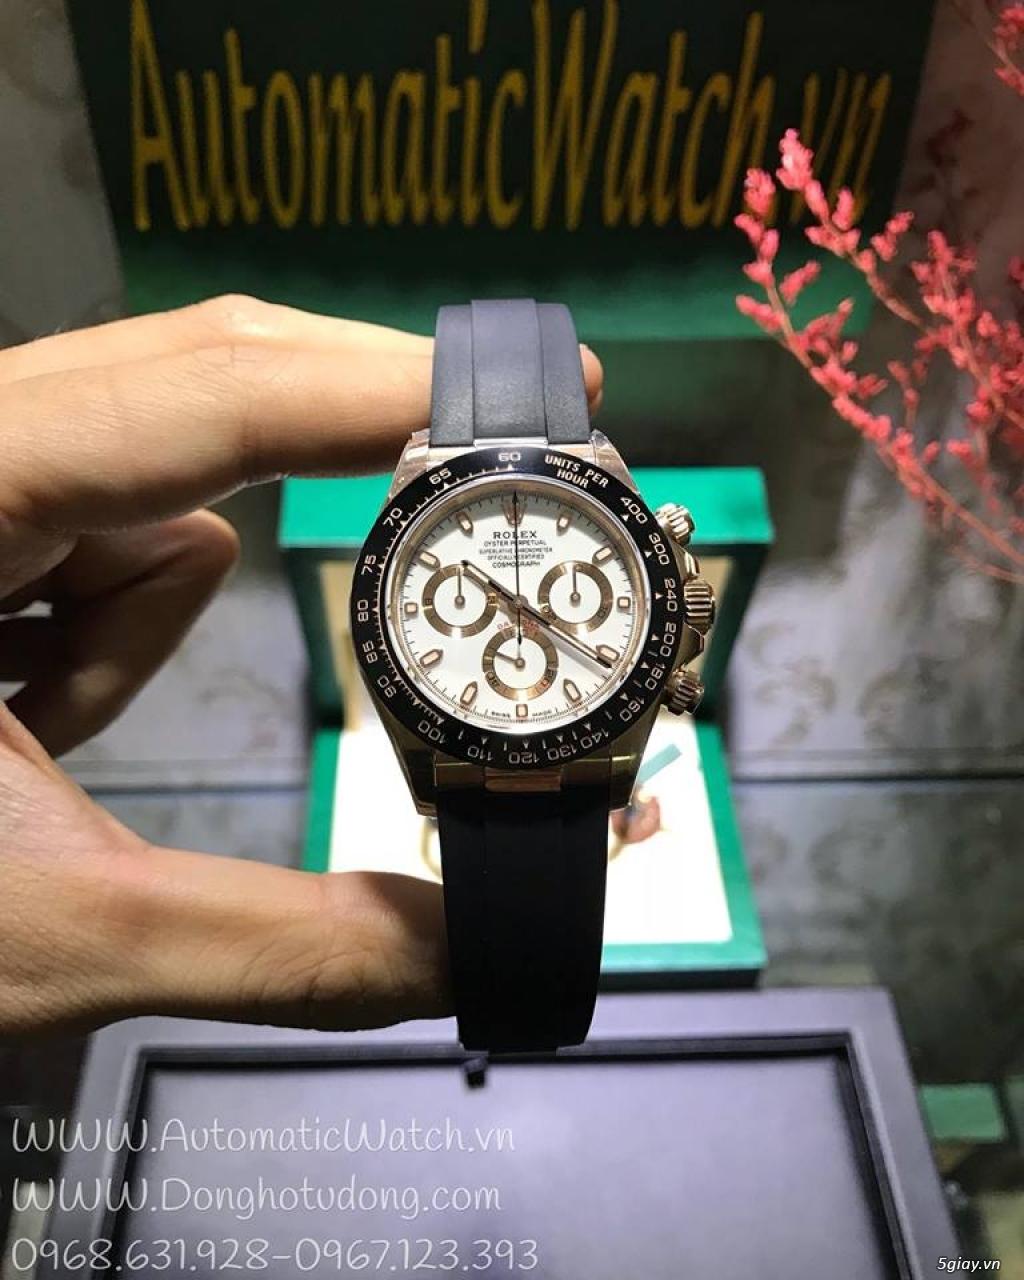 Chuyên đồng hồ Rolex,Hublot,AP, Patek Philippe...Replica1:1 Swiss Made - 4